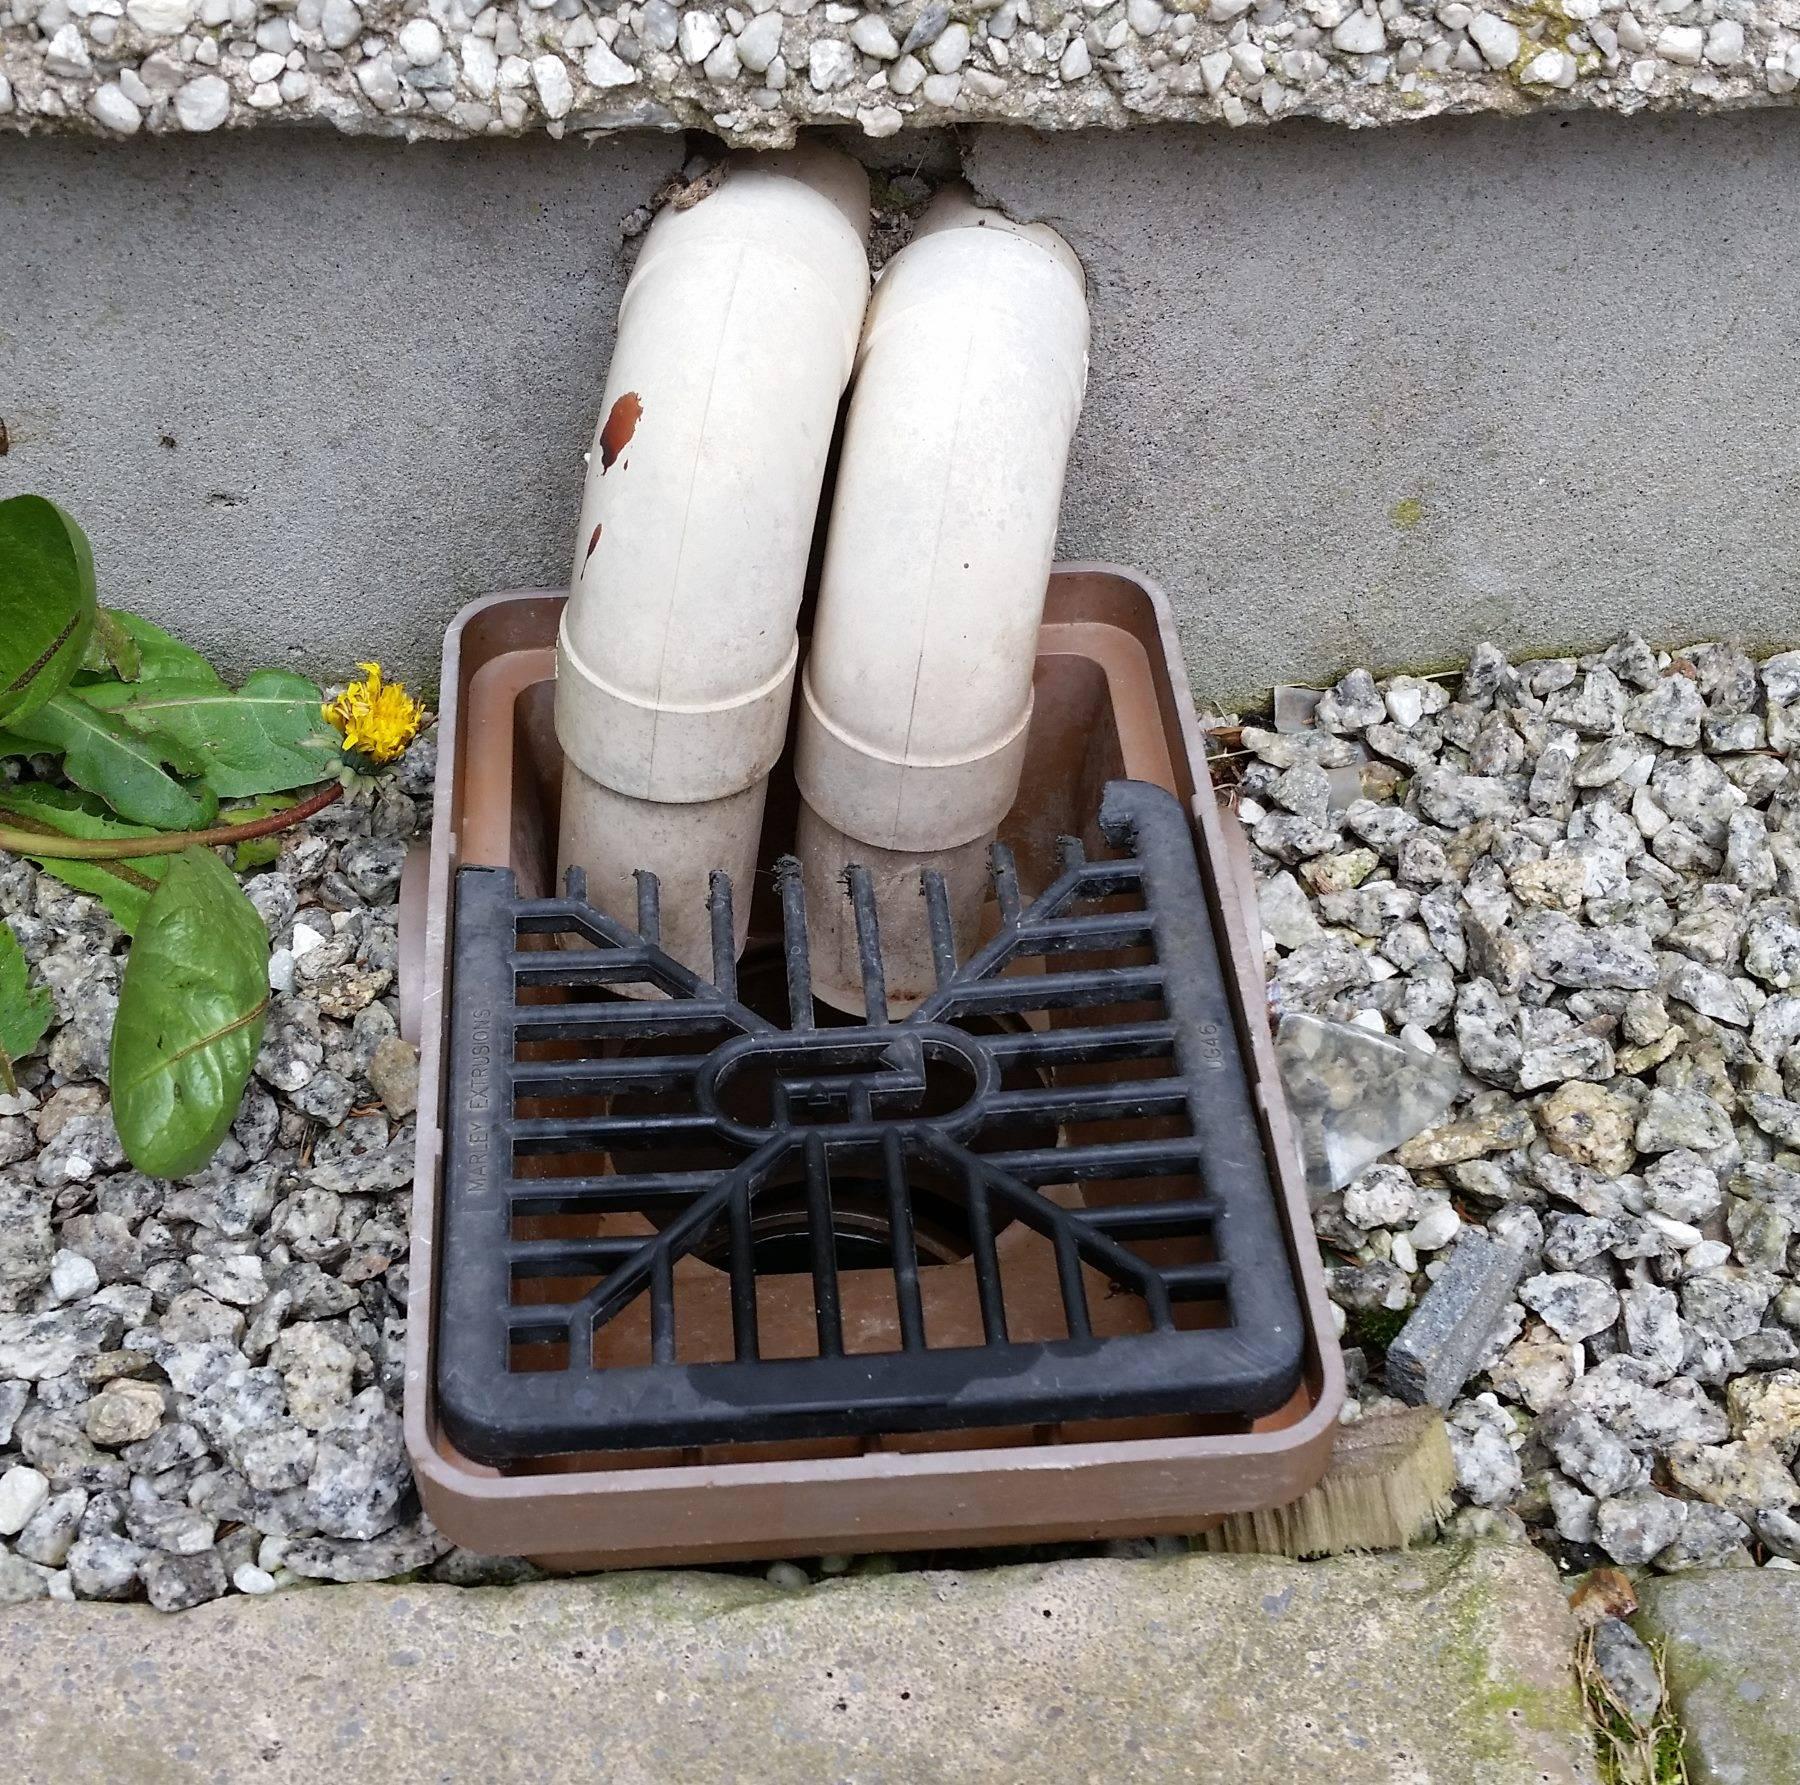 wind from kitchen sink drainage pipe kitchen sink drain diagram Drainage pipe is not sealed